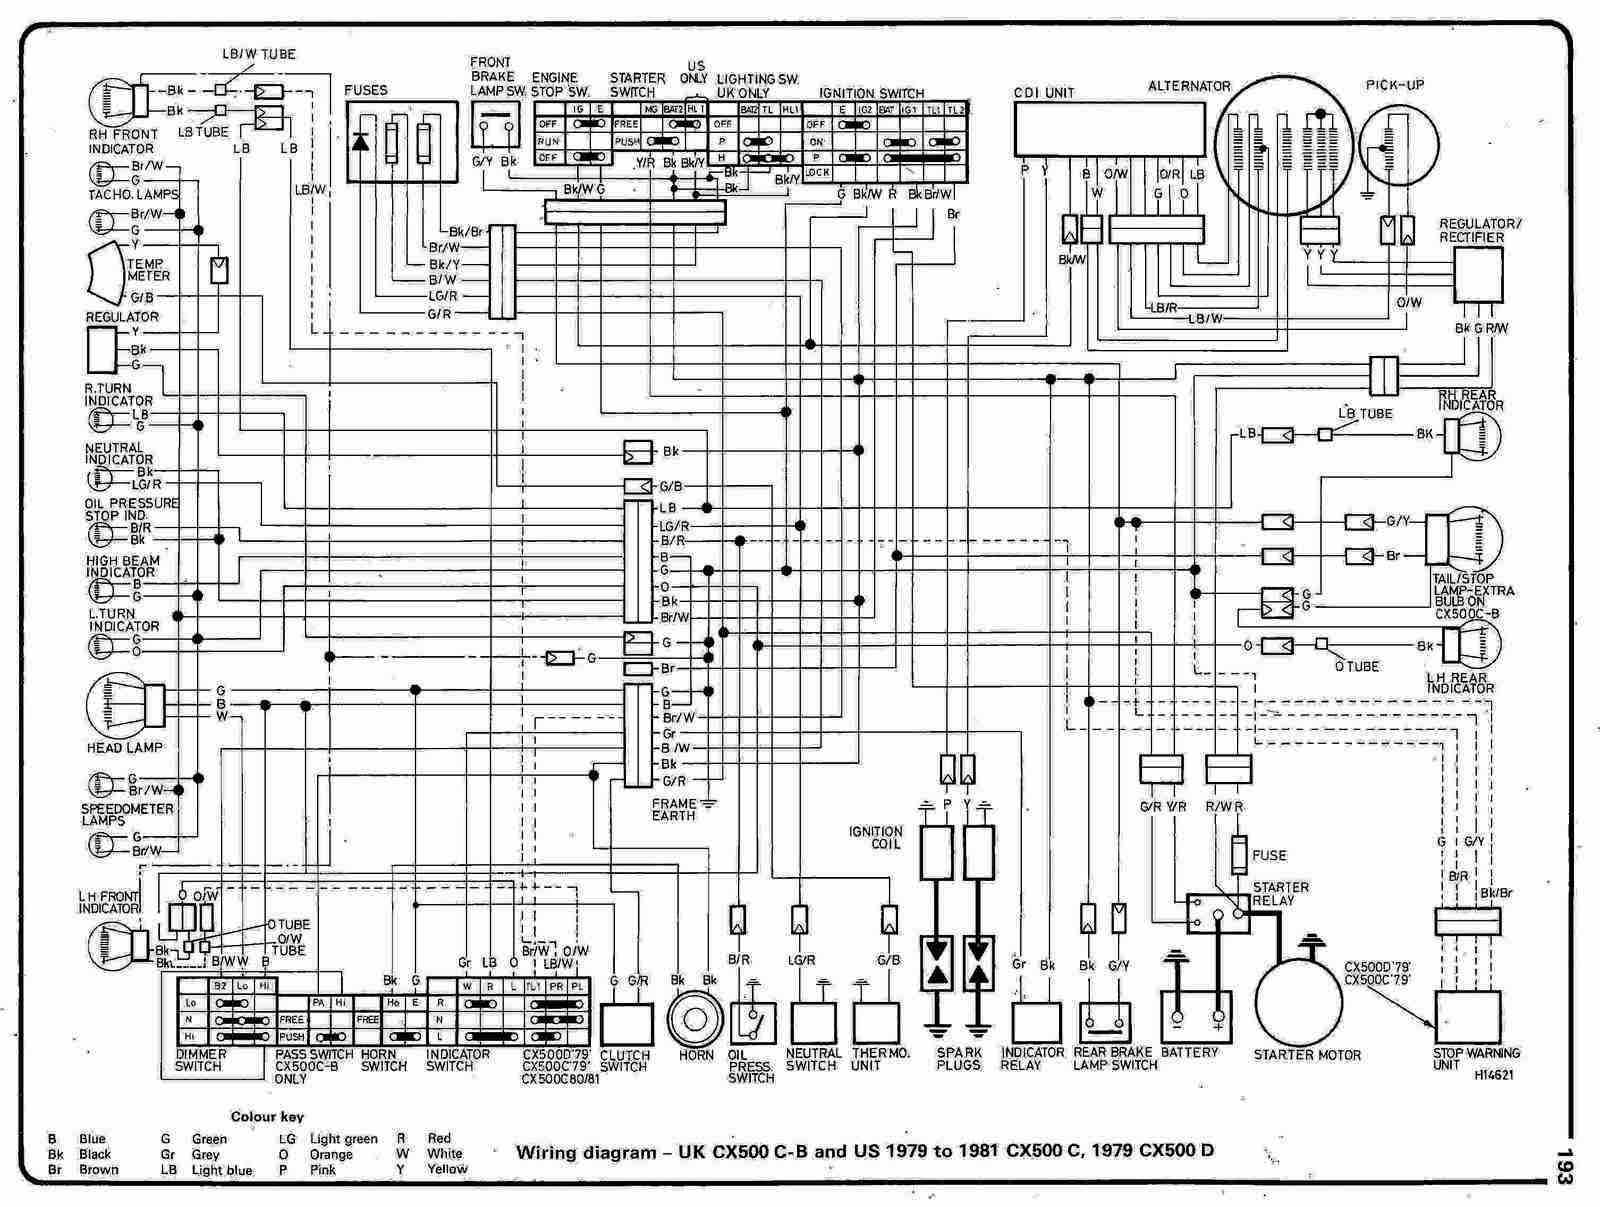 wiring diagram 2008 honda goldwing 2003 honda goldwing parts batteries for goldwing 2003 honda goldwing radio wiring wire center \\u2022 honda gl1200 wiring diagram 2003 gl1800